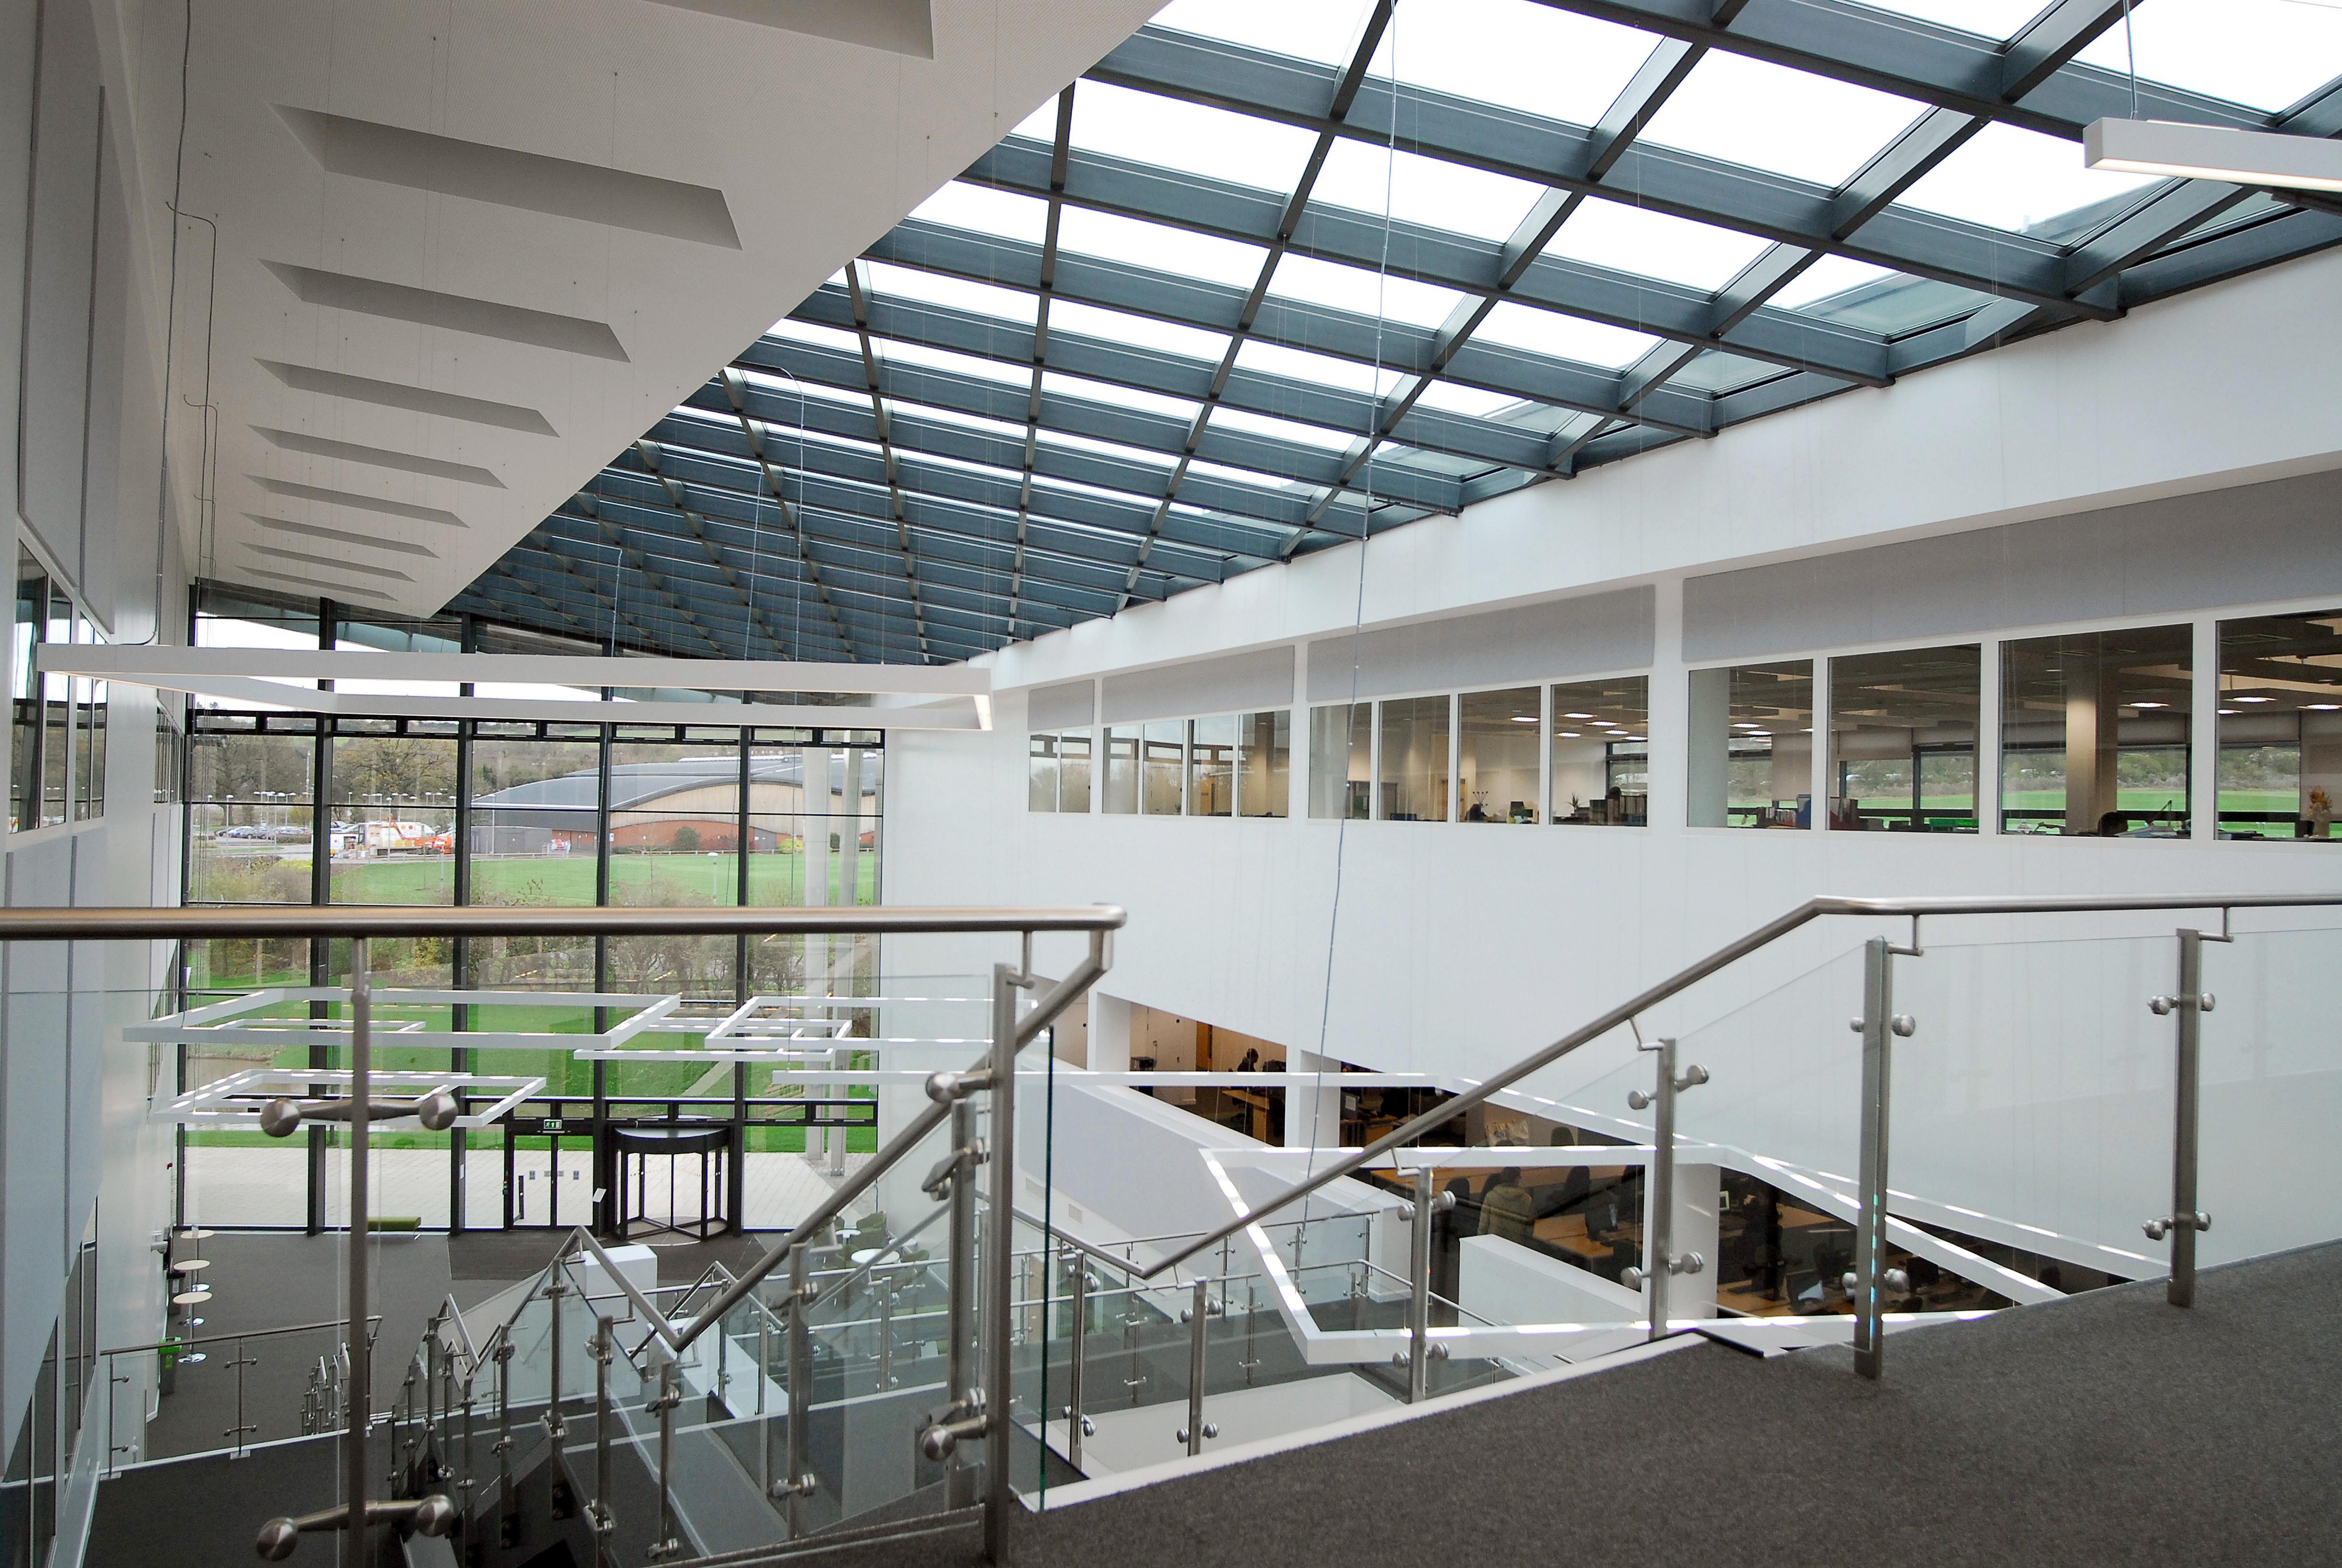 Surrey University School of Veterinary Science